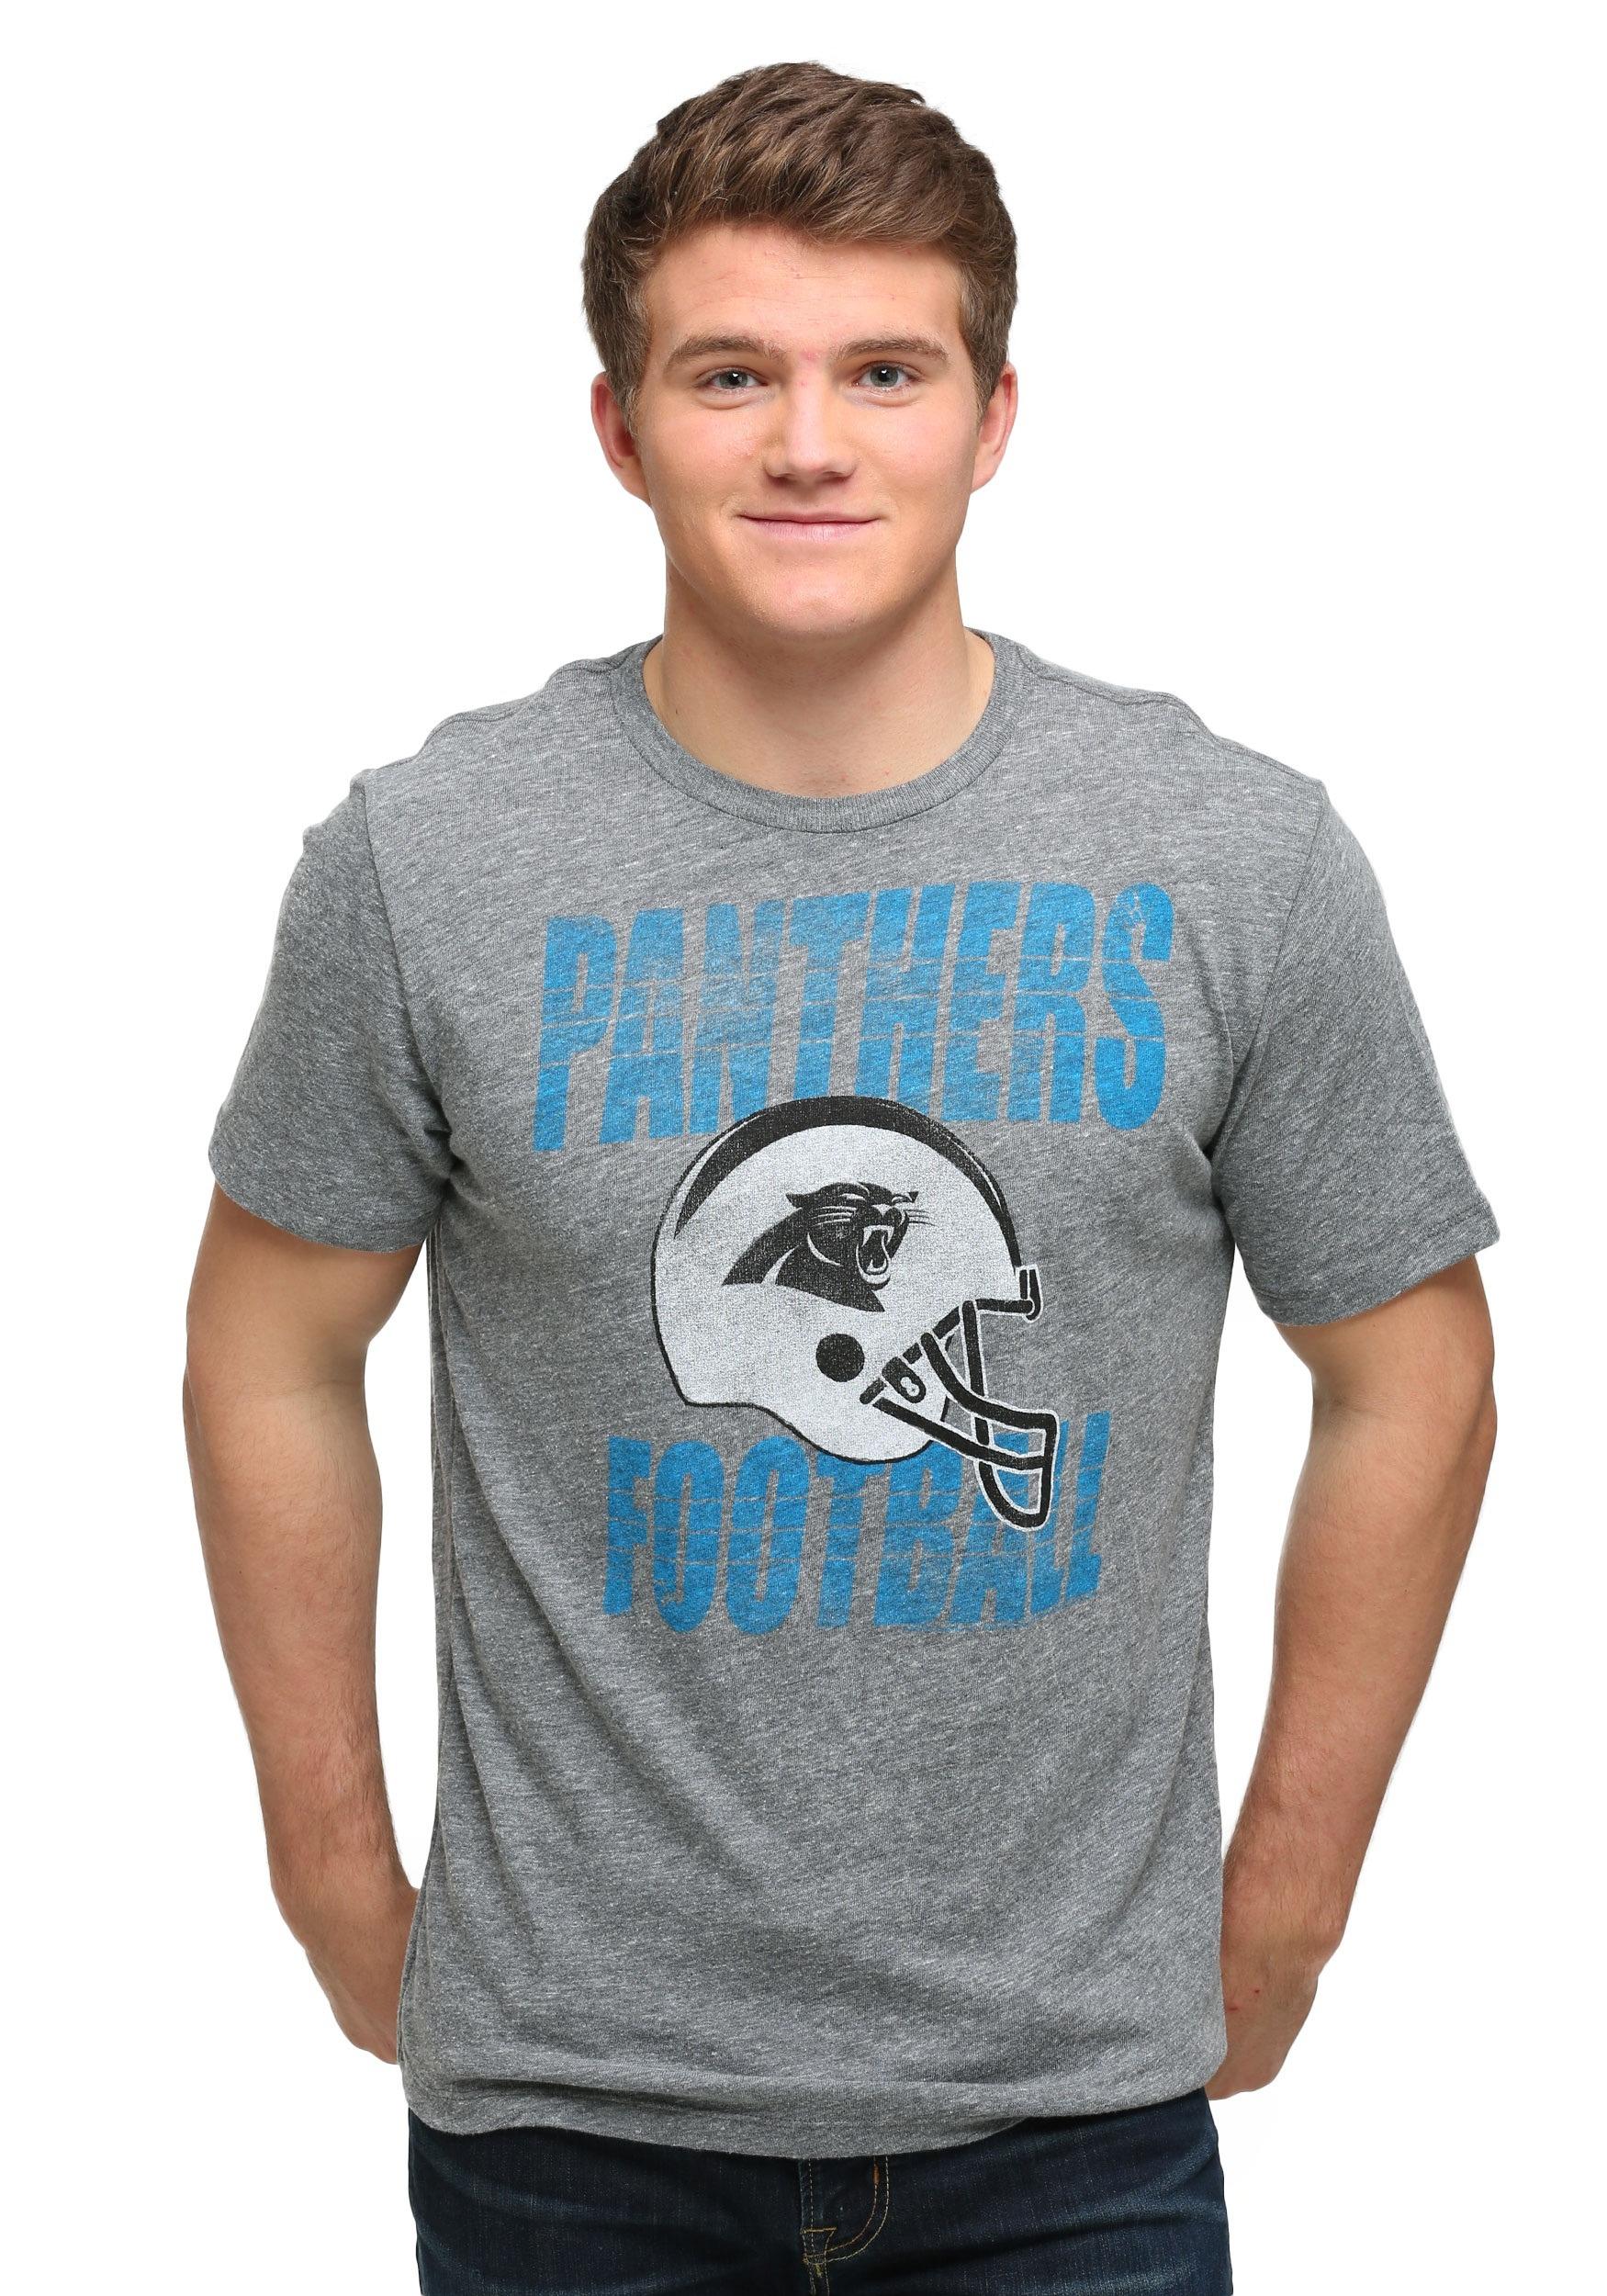 39d3e68e7 Carolina Panthers Touchdown Tri-Blend Men s T-Shirt